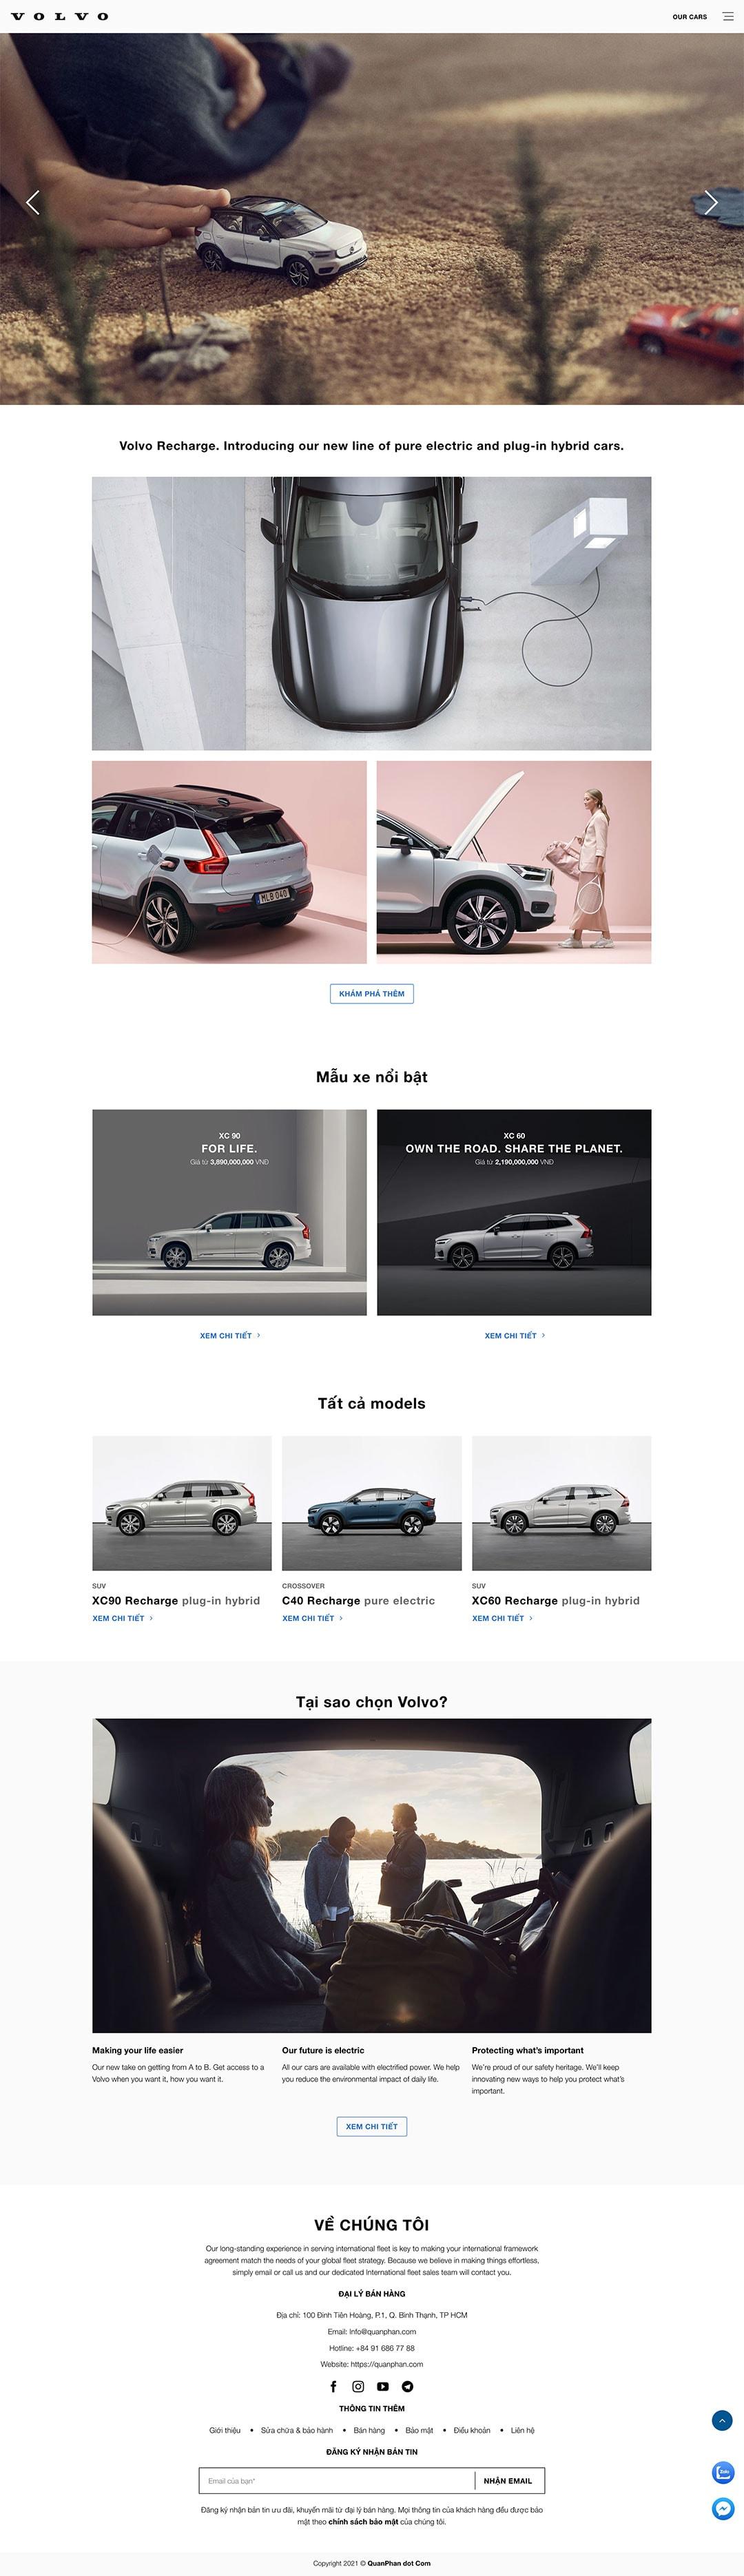 thiet ke website ban xe oto dep